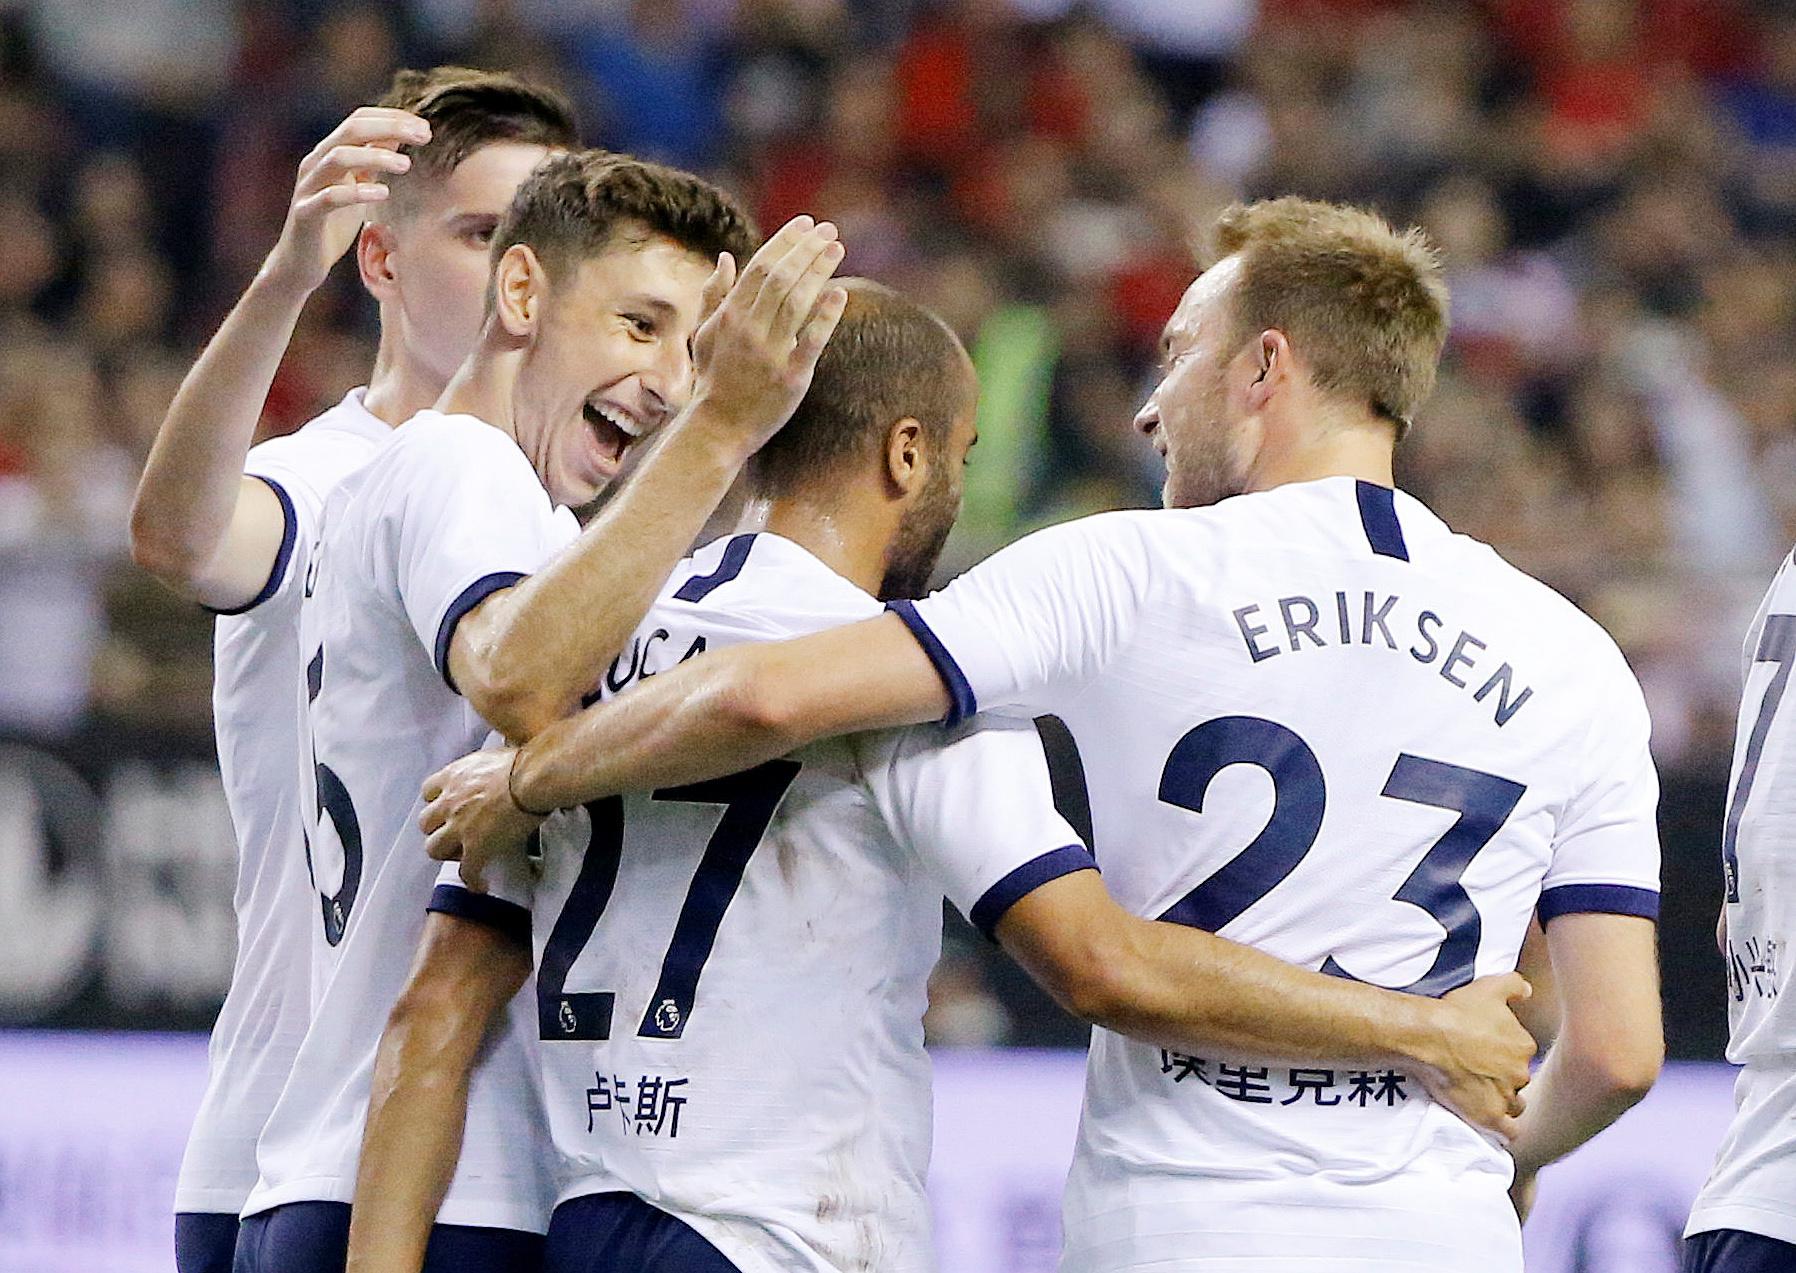 Football - Transferts - Pogba, Dybala, Sané... Les derniers dossiers chauds en Premier League